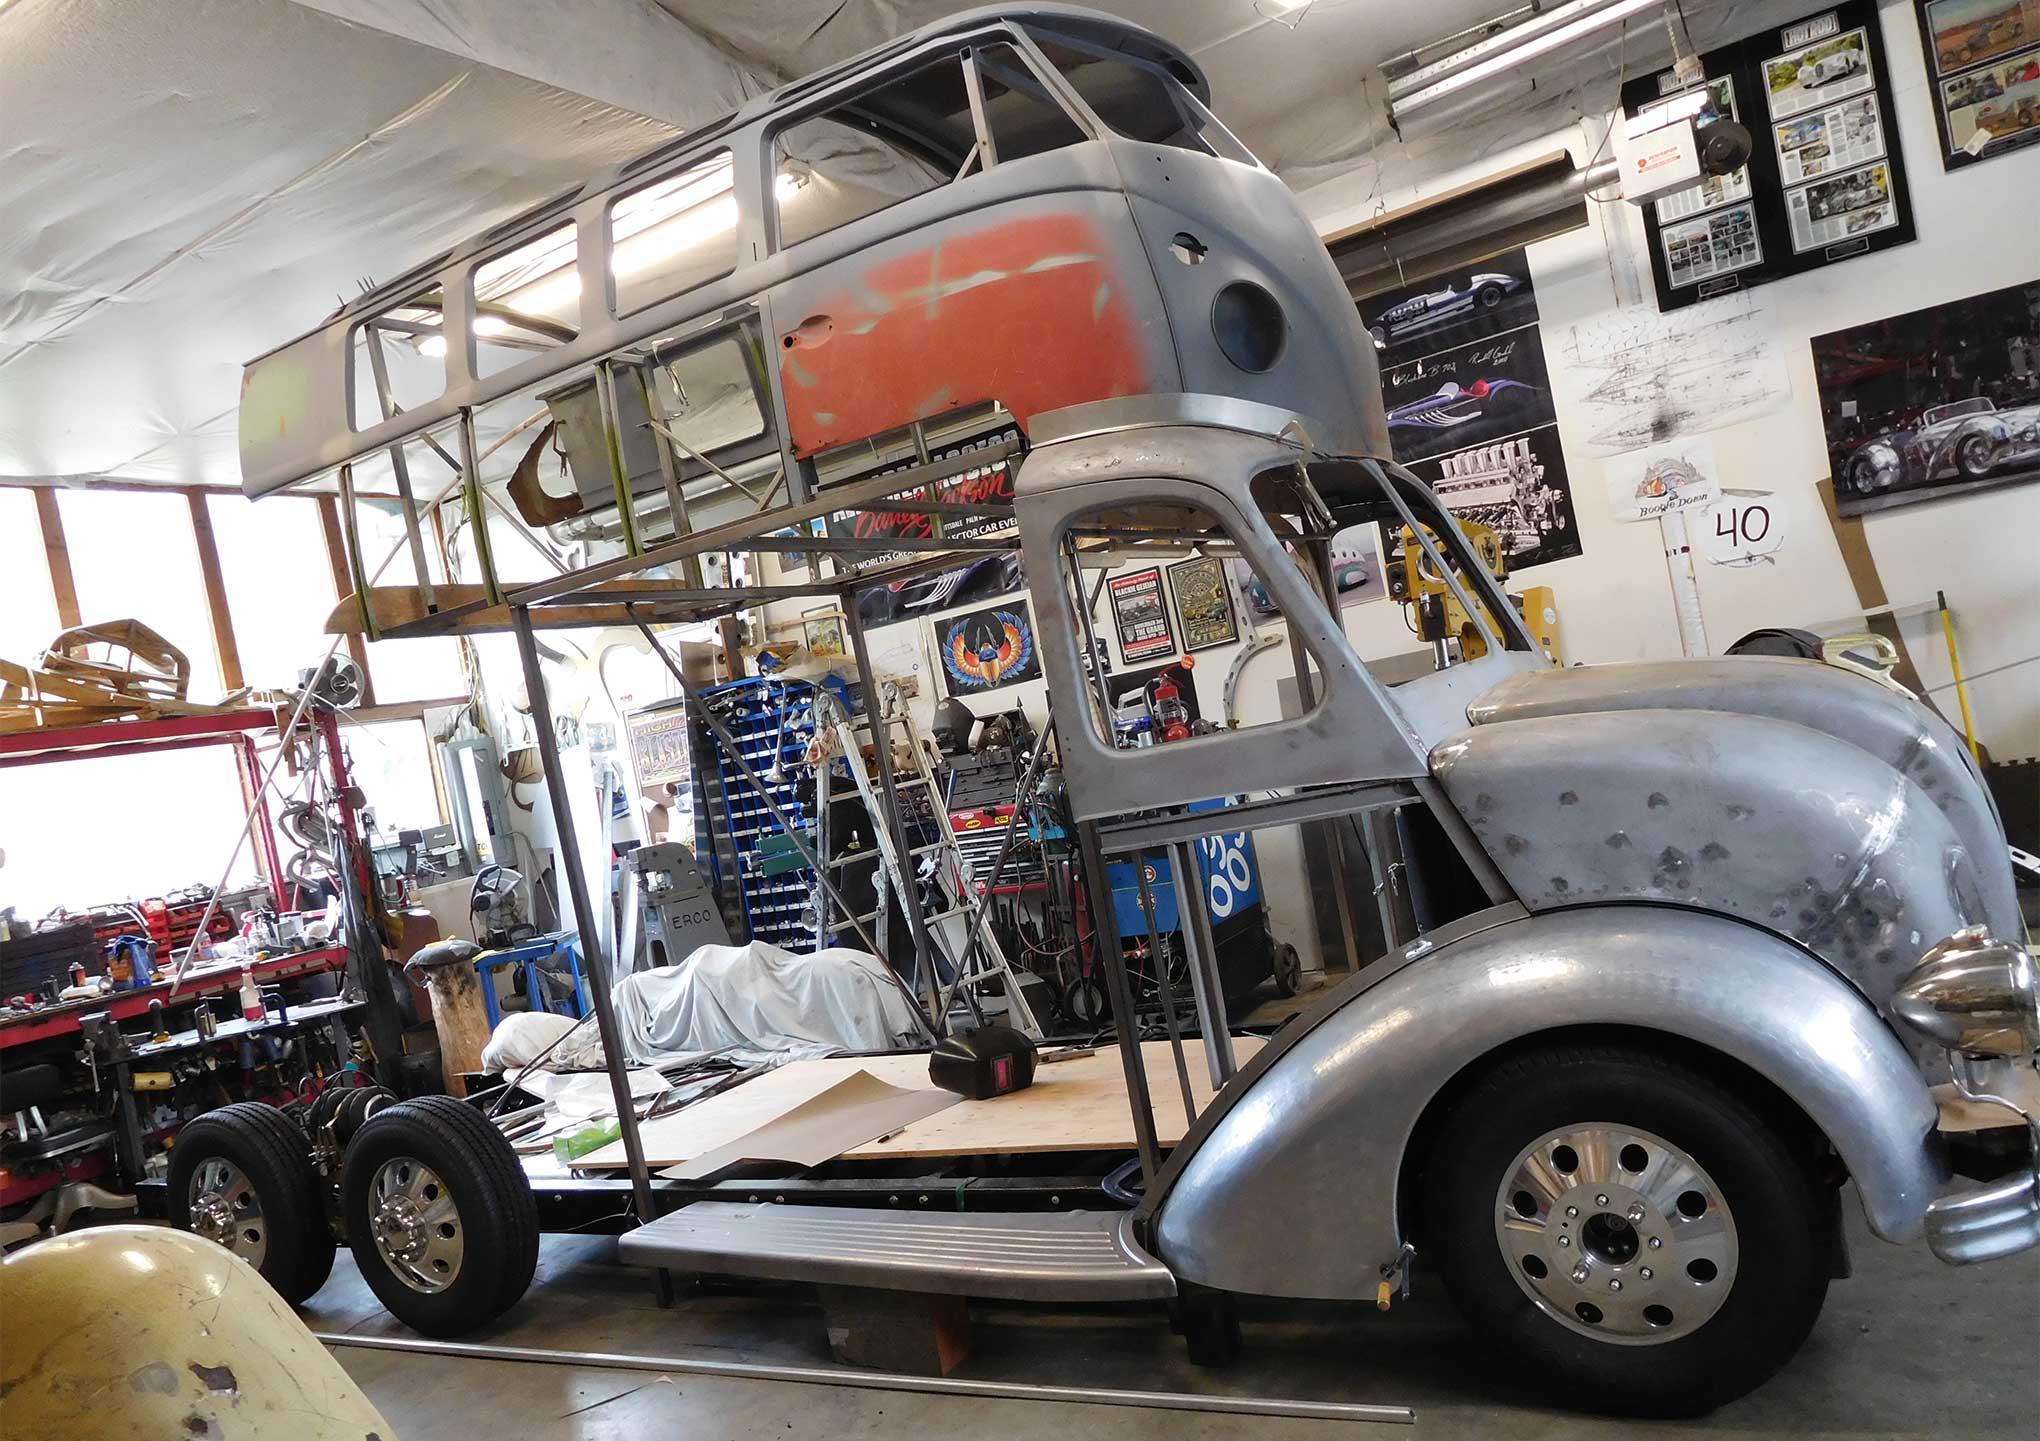 Randy Grubb's Magic Bus in progress